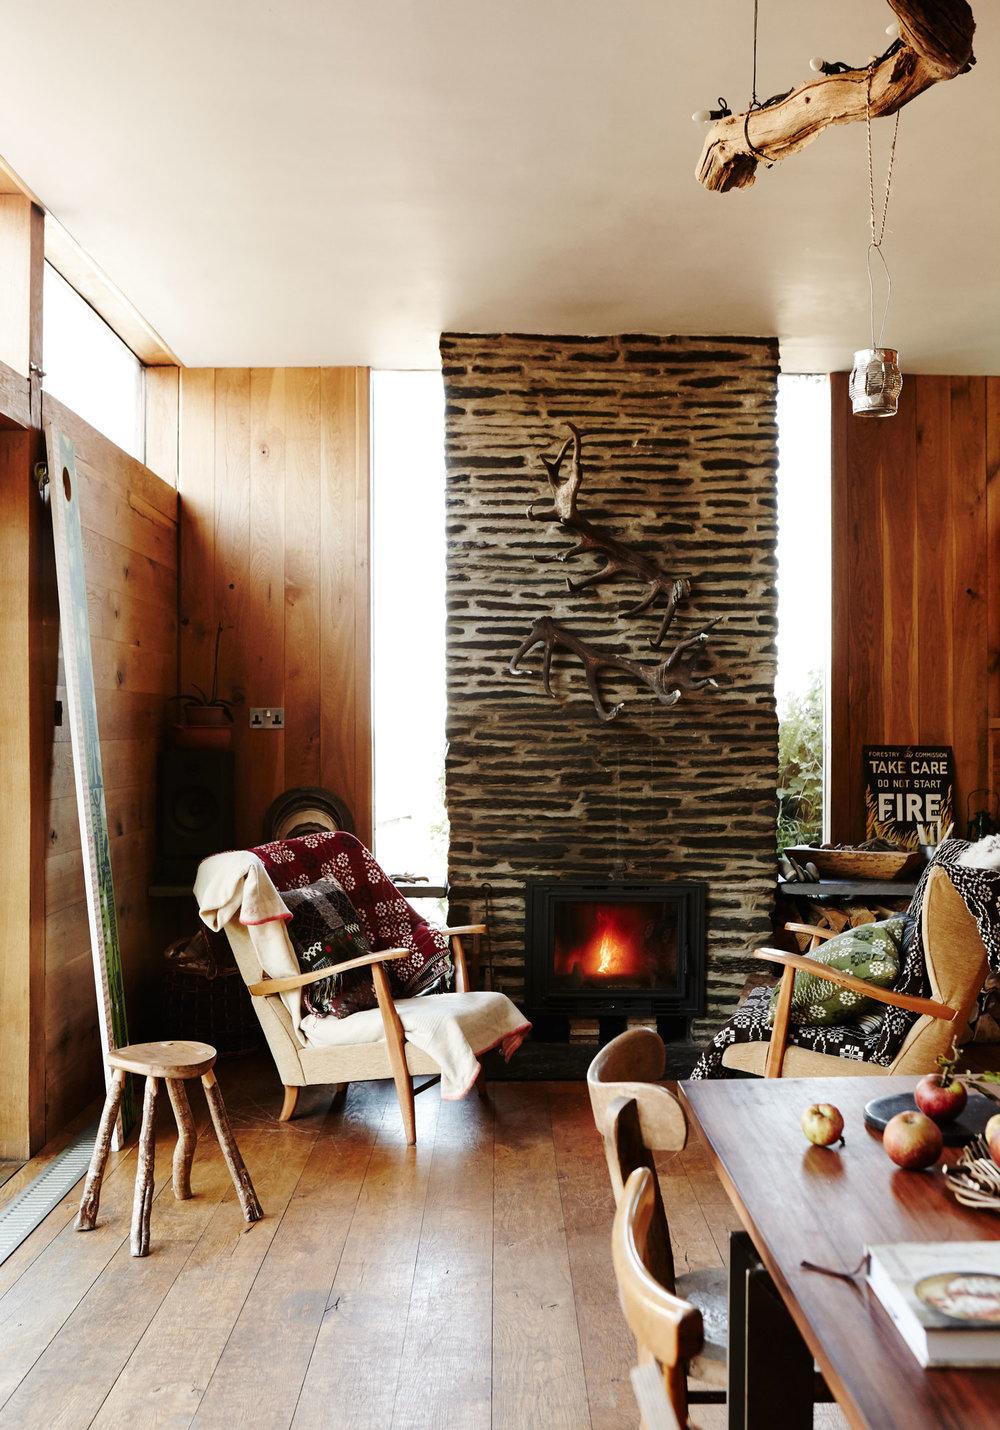 stone_fireplace_cosy_interior.jpg